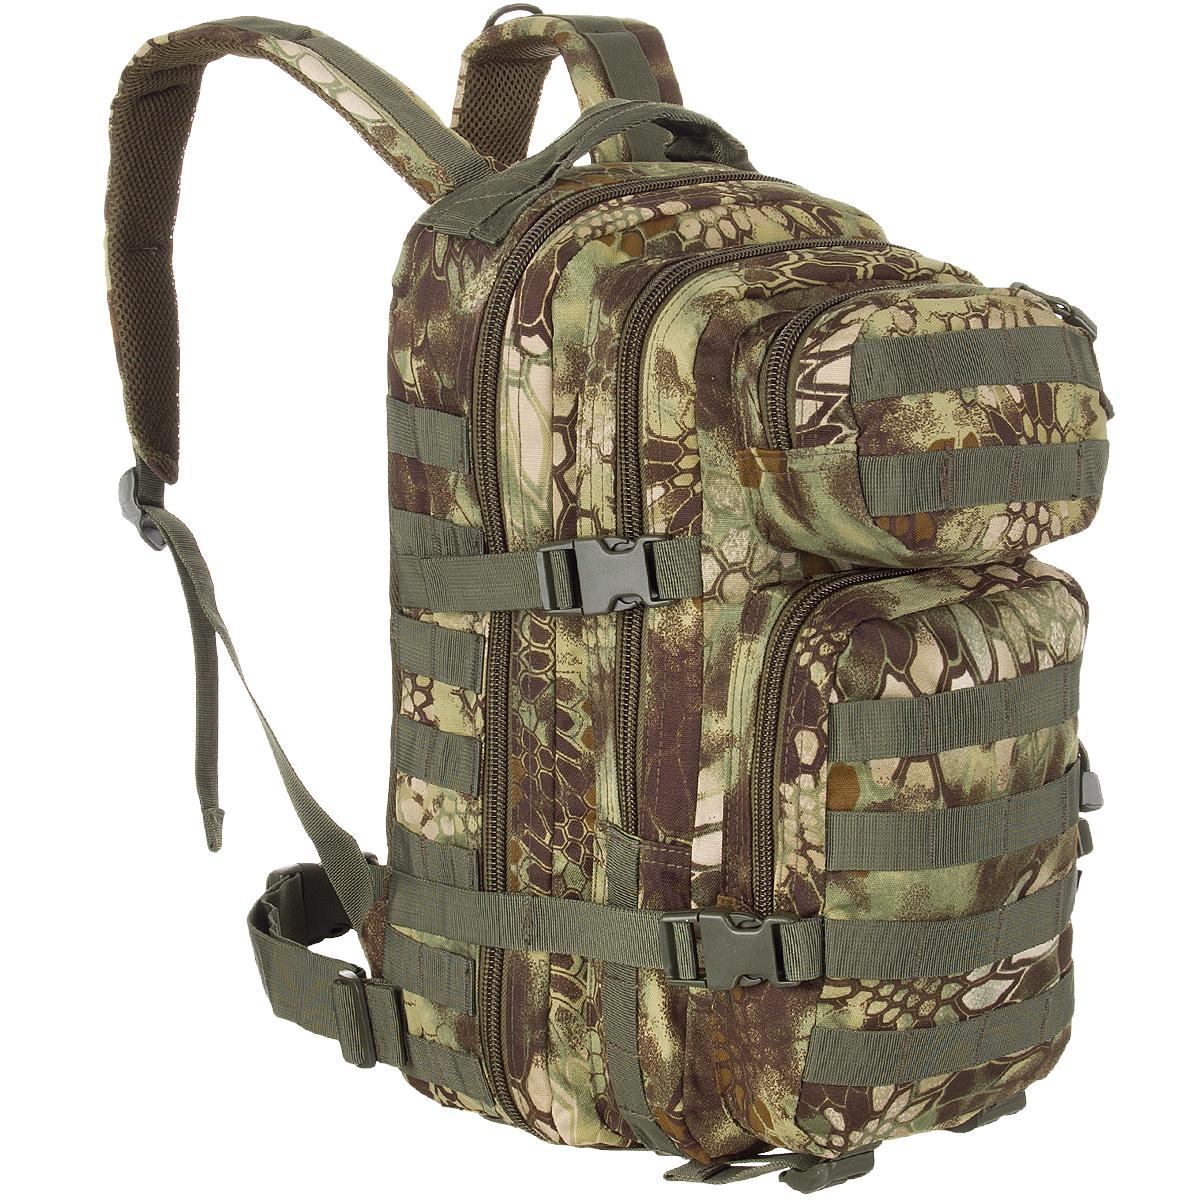 Mil-Tec US Assault Pack Small Patrol Tactical Combat Hiking Backpack Urban Grey